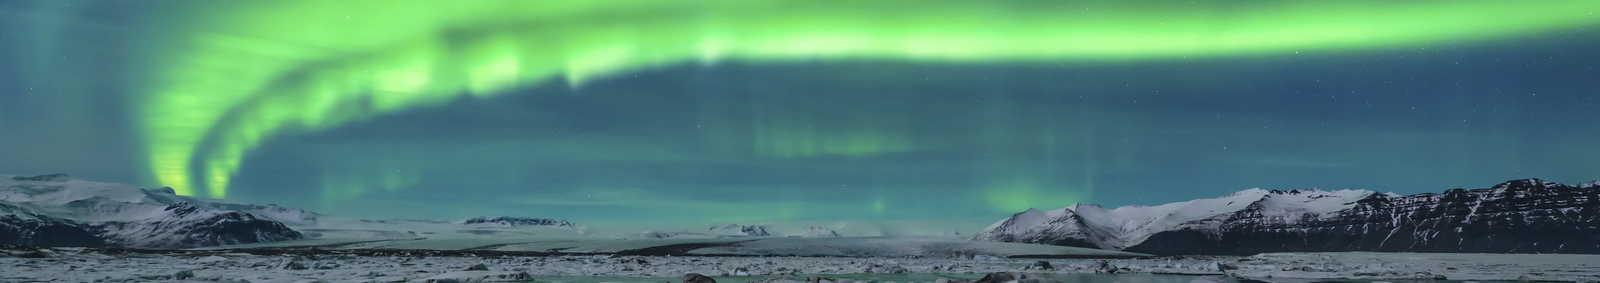 Aurora over Jokulsarlon, Sweden